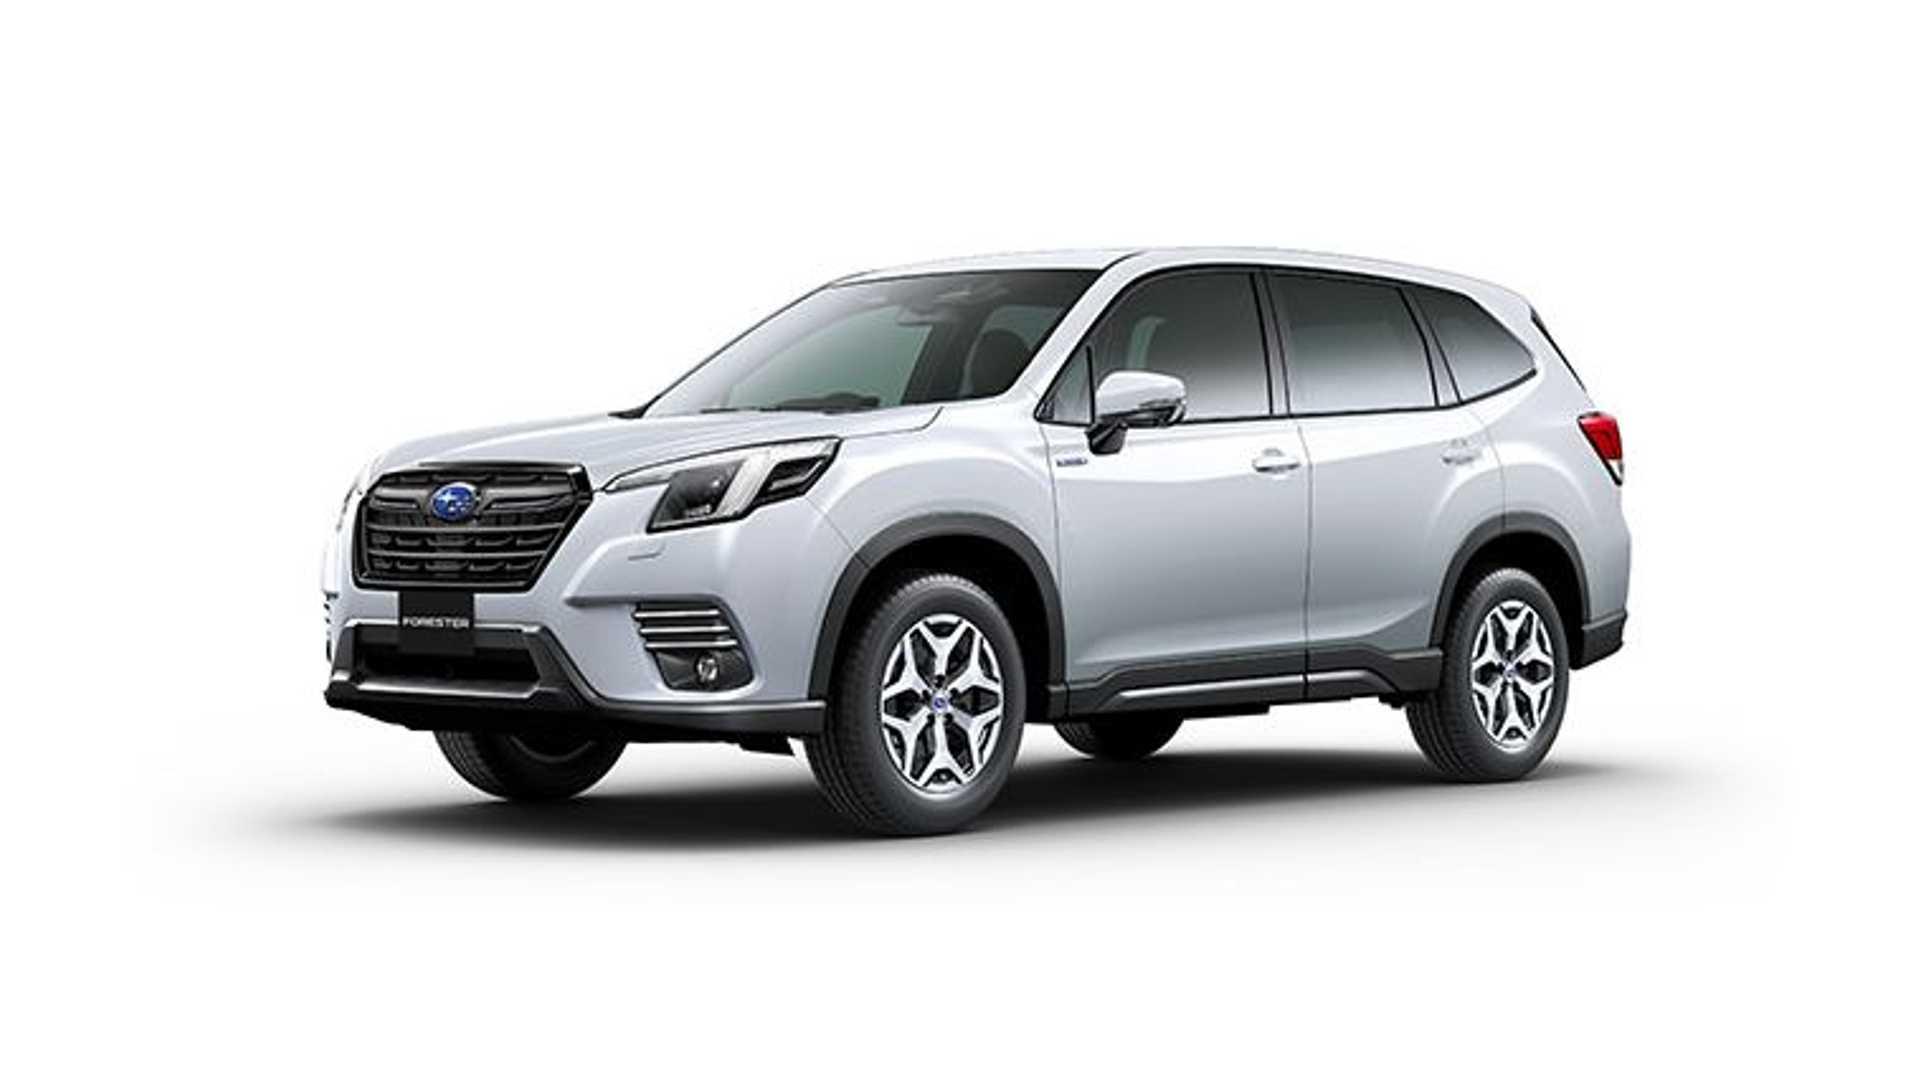 Subaru-Forester-facelift-11